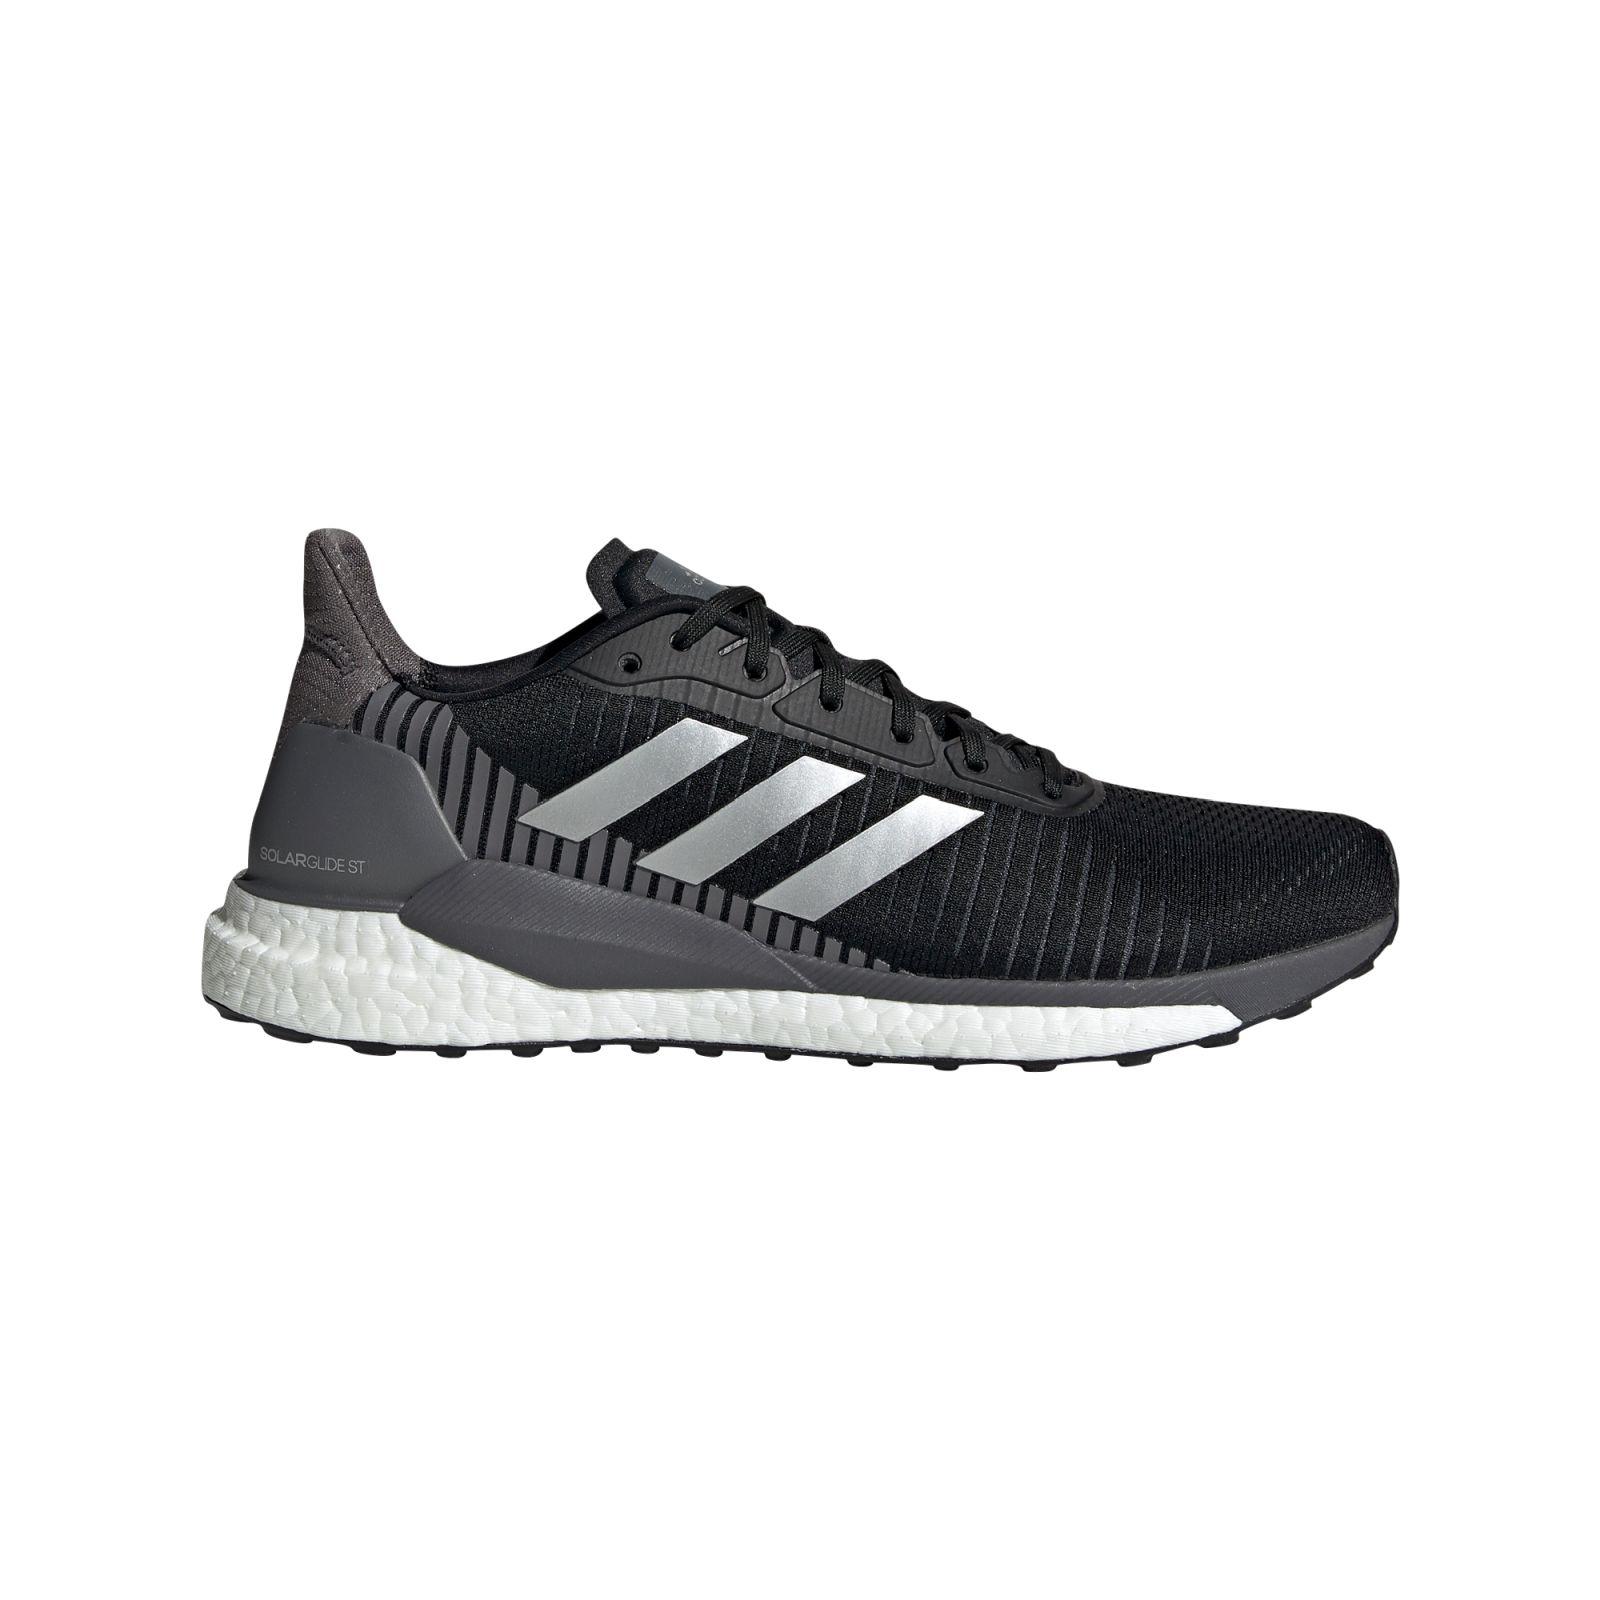 Details about Adidas Performance Mens Running Running Shoe Solar Glide ST 19 M Boost Black show original title